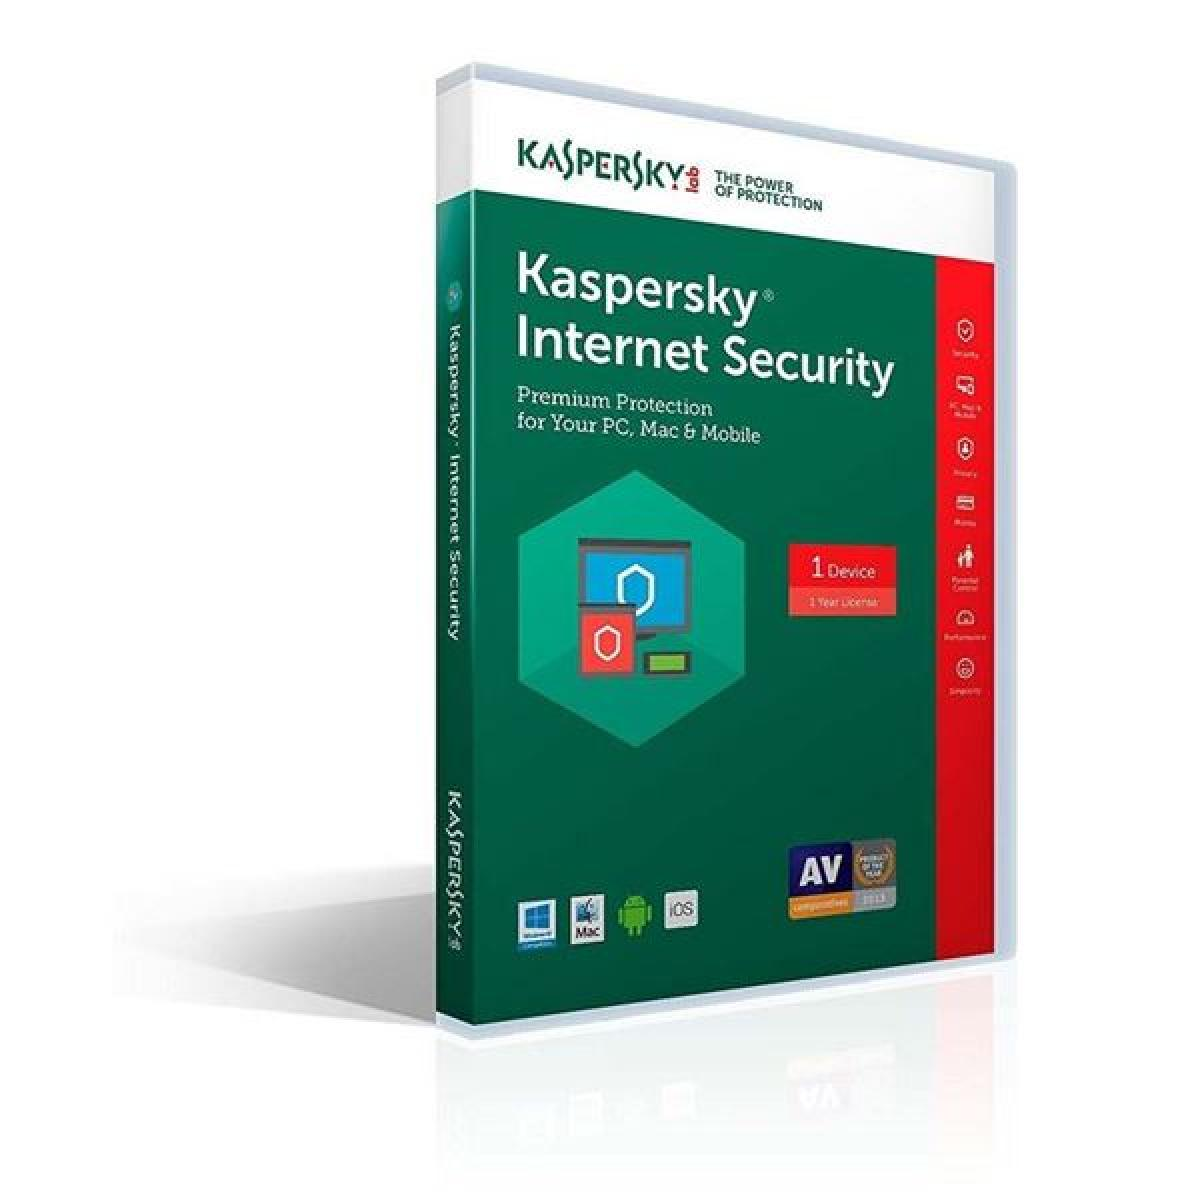 Kaspersky Internet Security 2017 | KIS2017 | Smart Systems | Amman Jordan